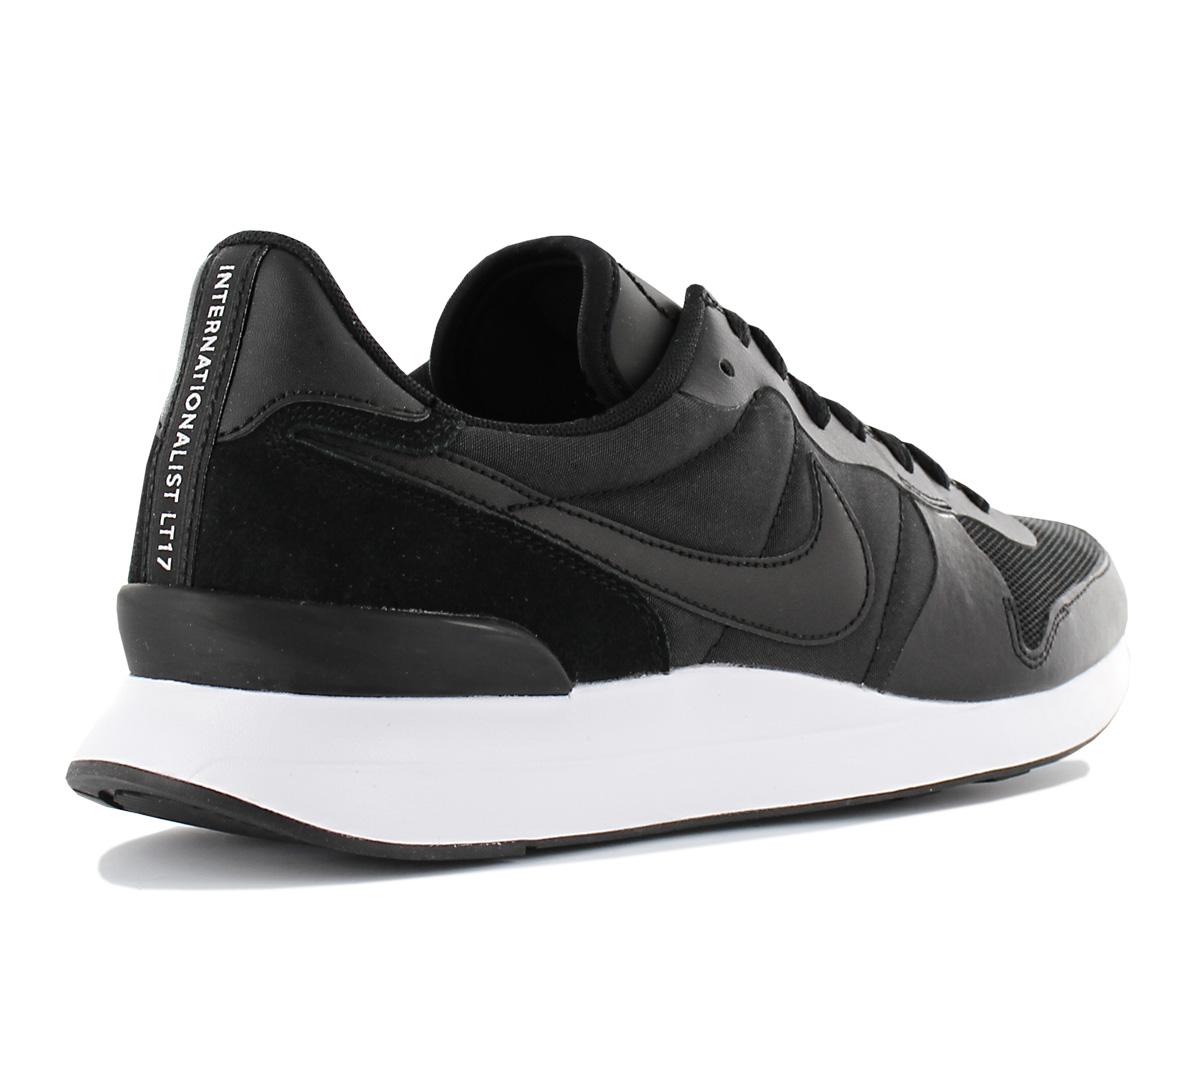 0b883870089 Nike Internationalist Lt 17 Men s Sneakers Retro Shoes Black Vortex ...